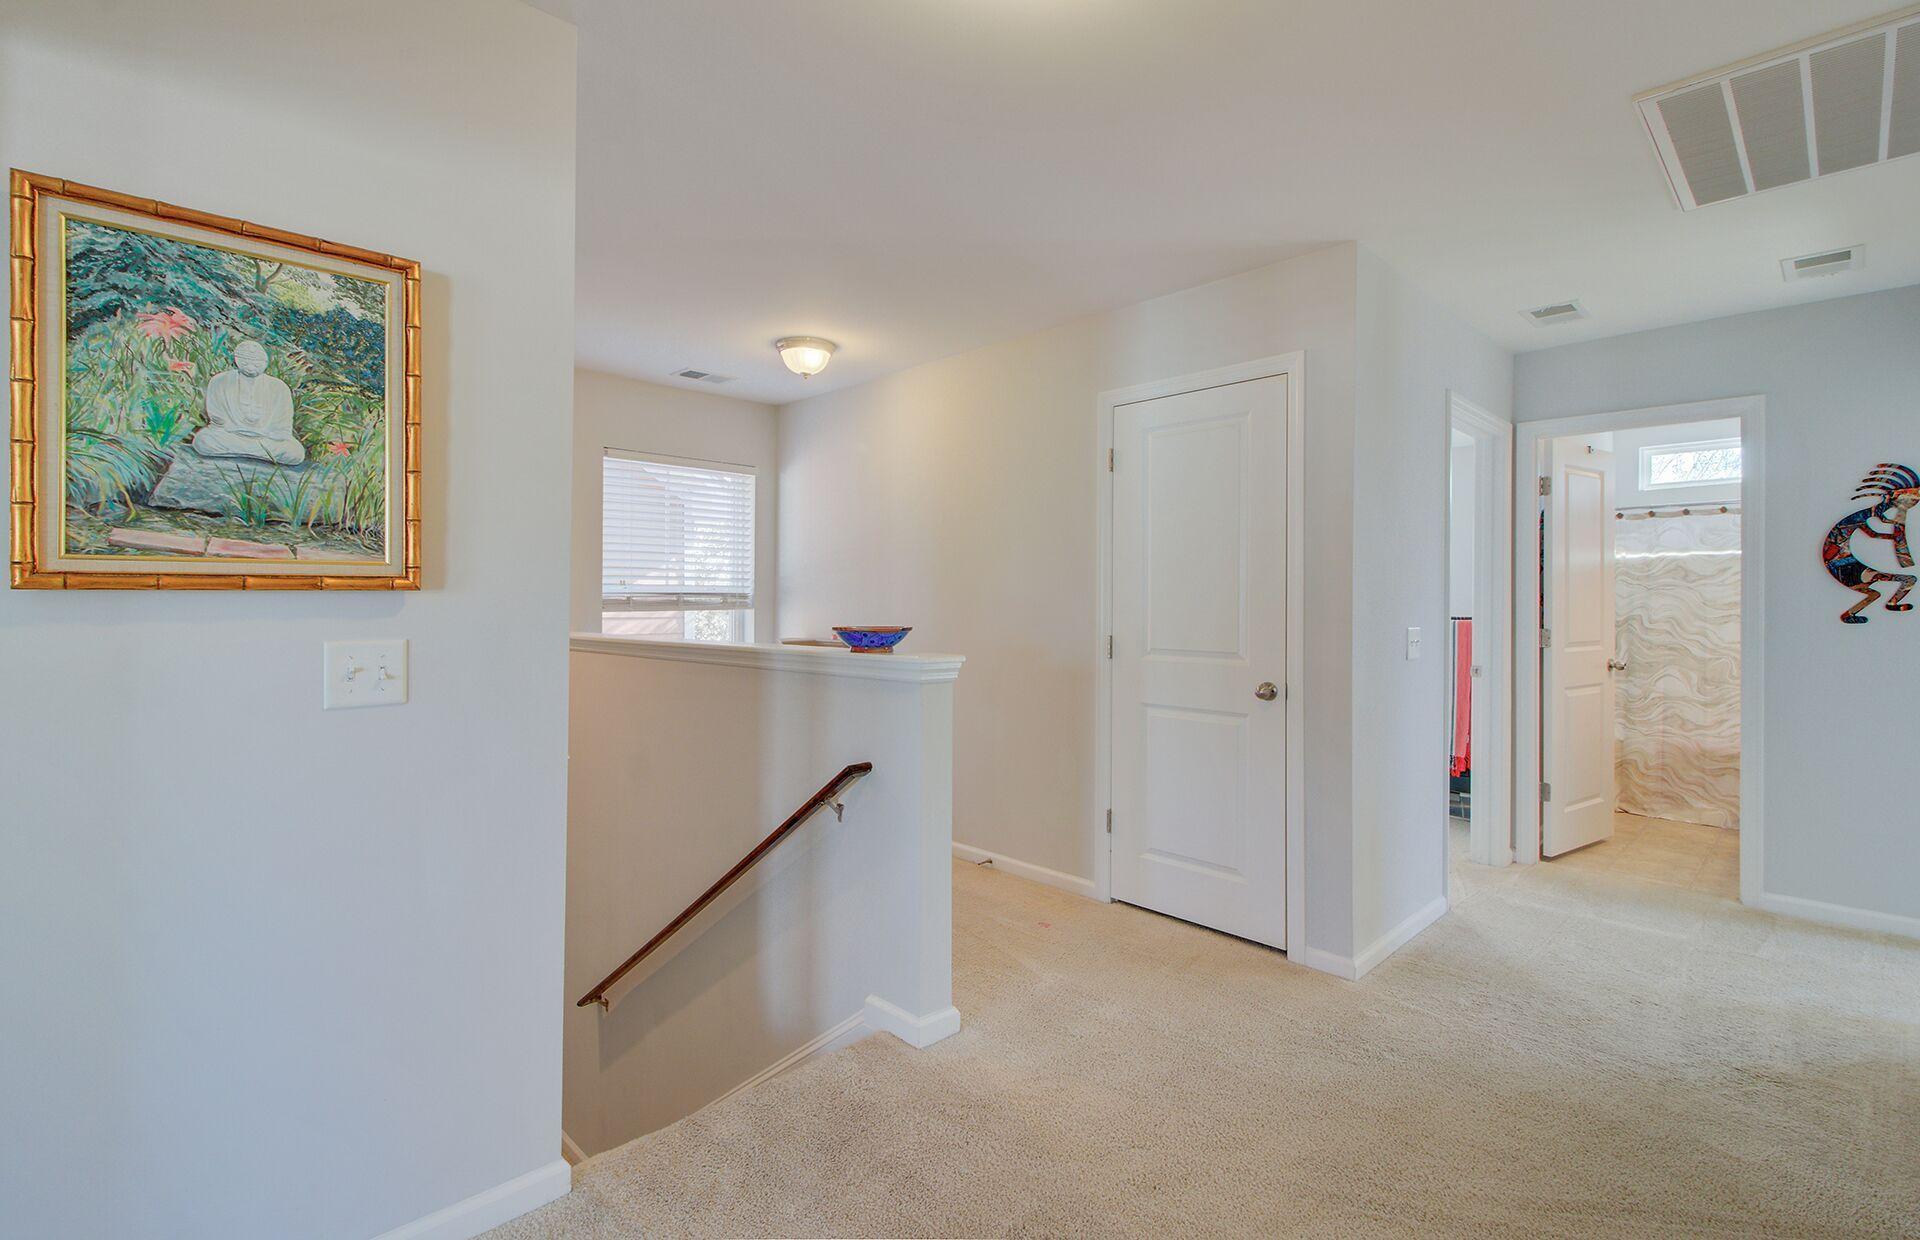 Oak Terrace Preserve Homes For Sale - 4967 Liberty Park, North Charleston, SC - 25